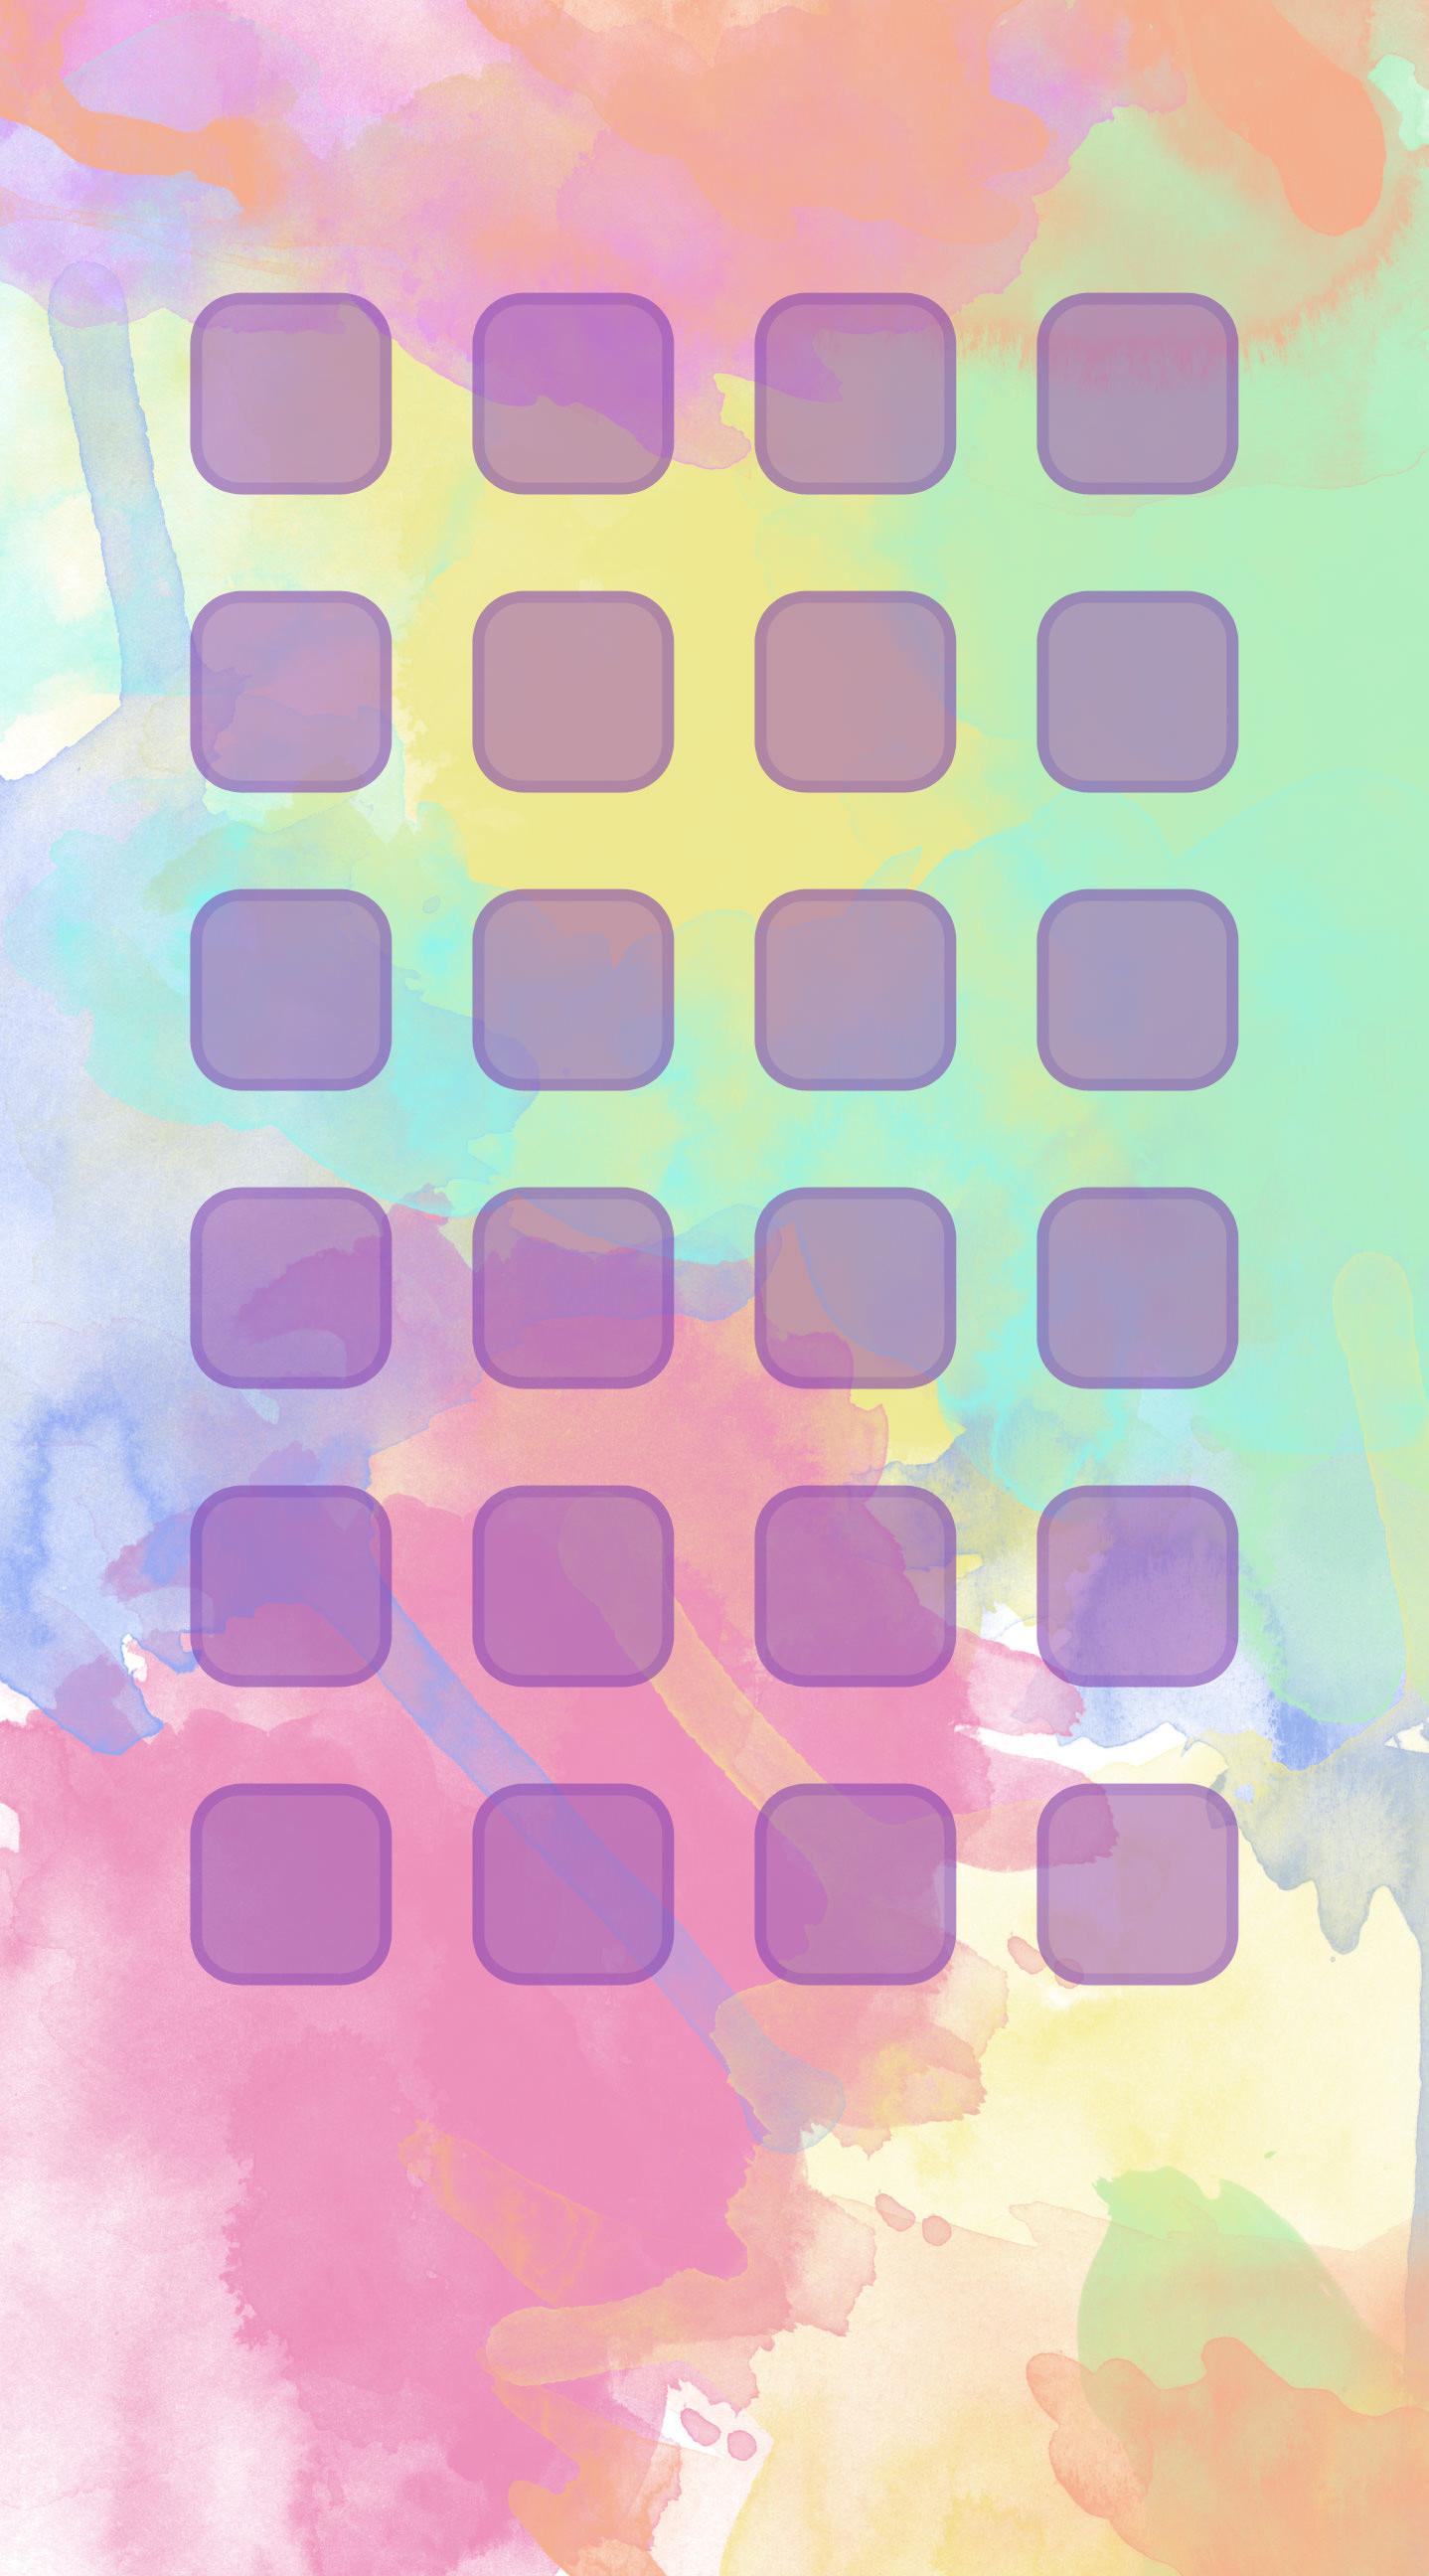 Iphone Christmas Shelf Wallpaper Cool Teenage Wallpapers 41 Images